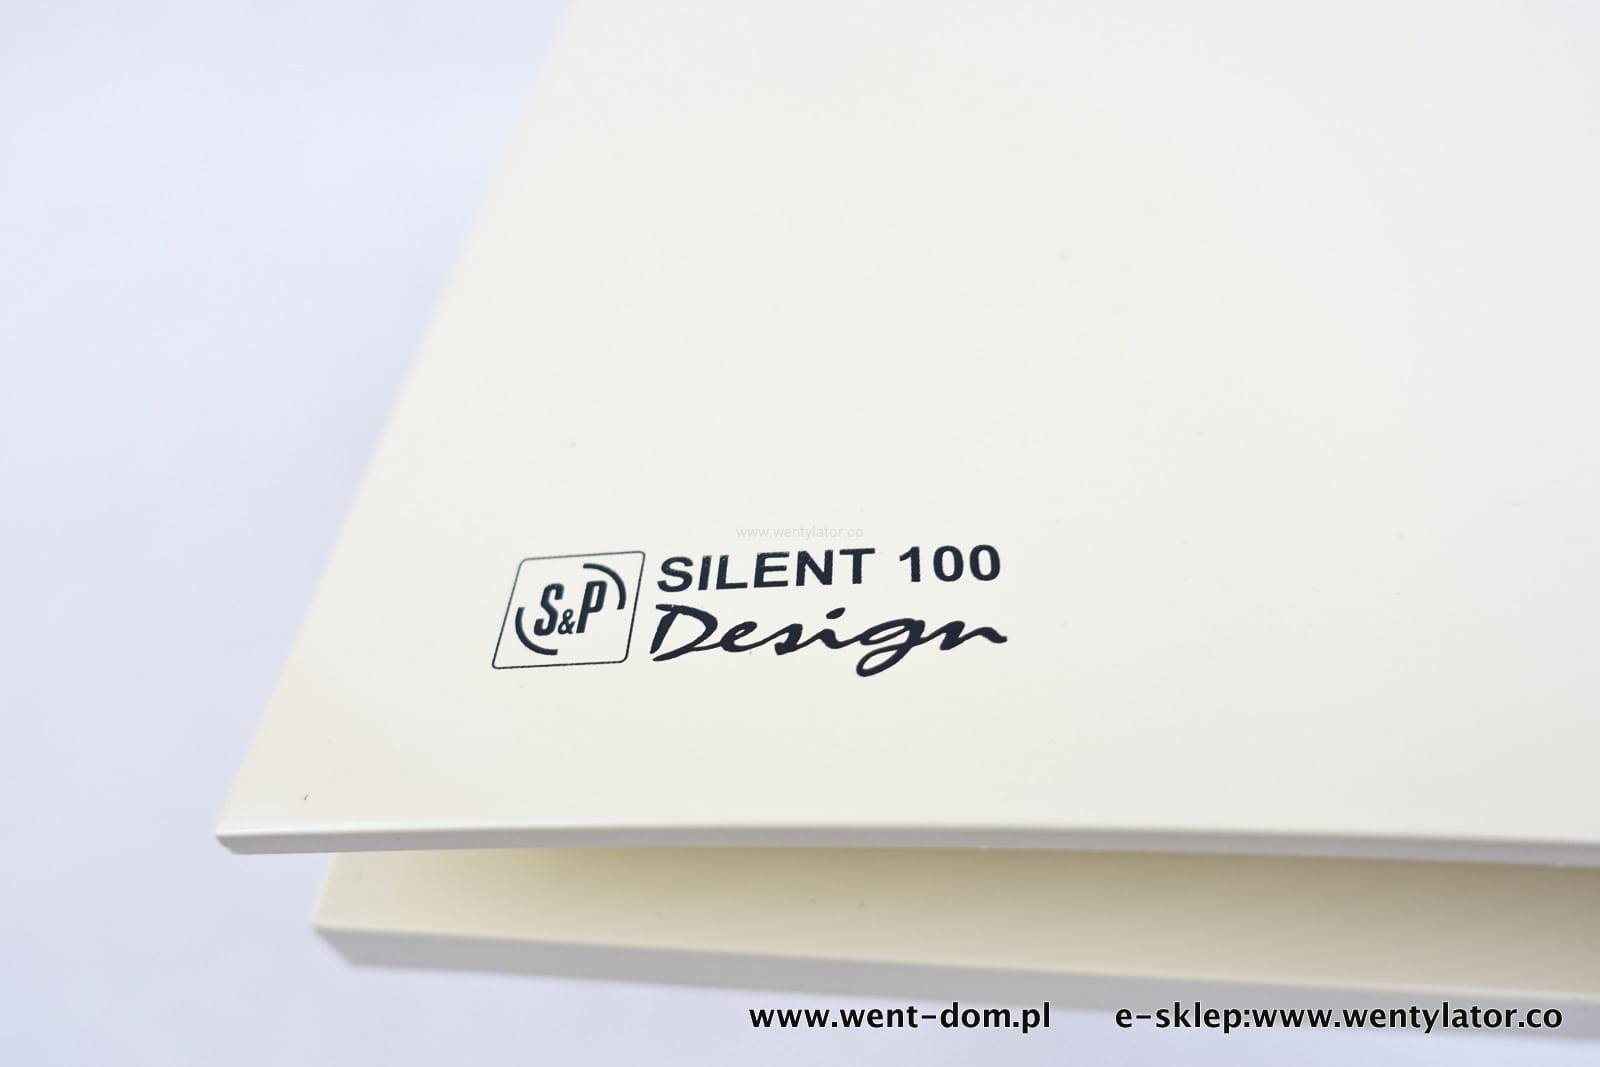 Wentylator silent design kremowy 100crz timer went dom for Decor 100 silent